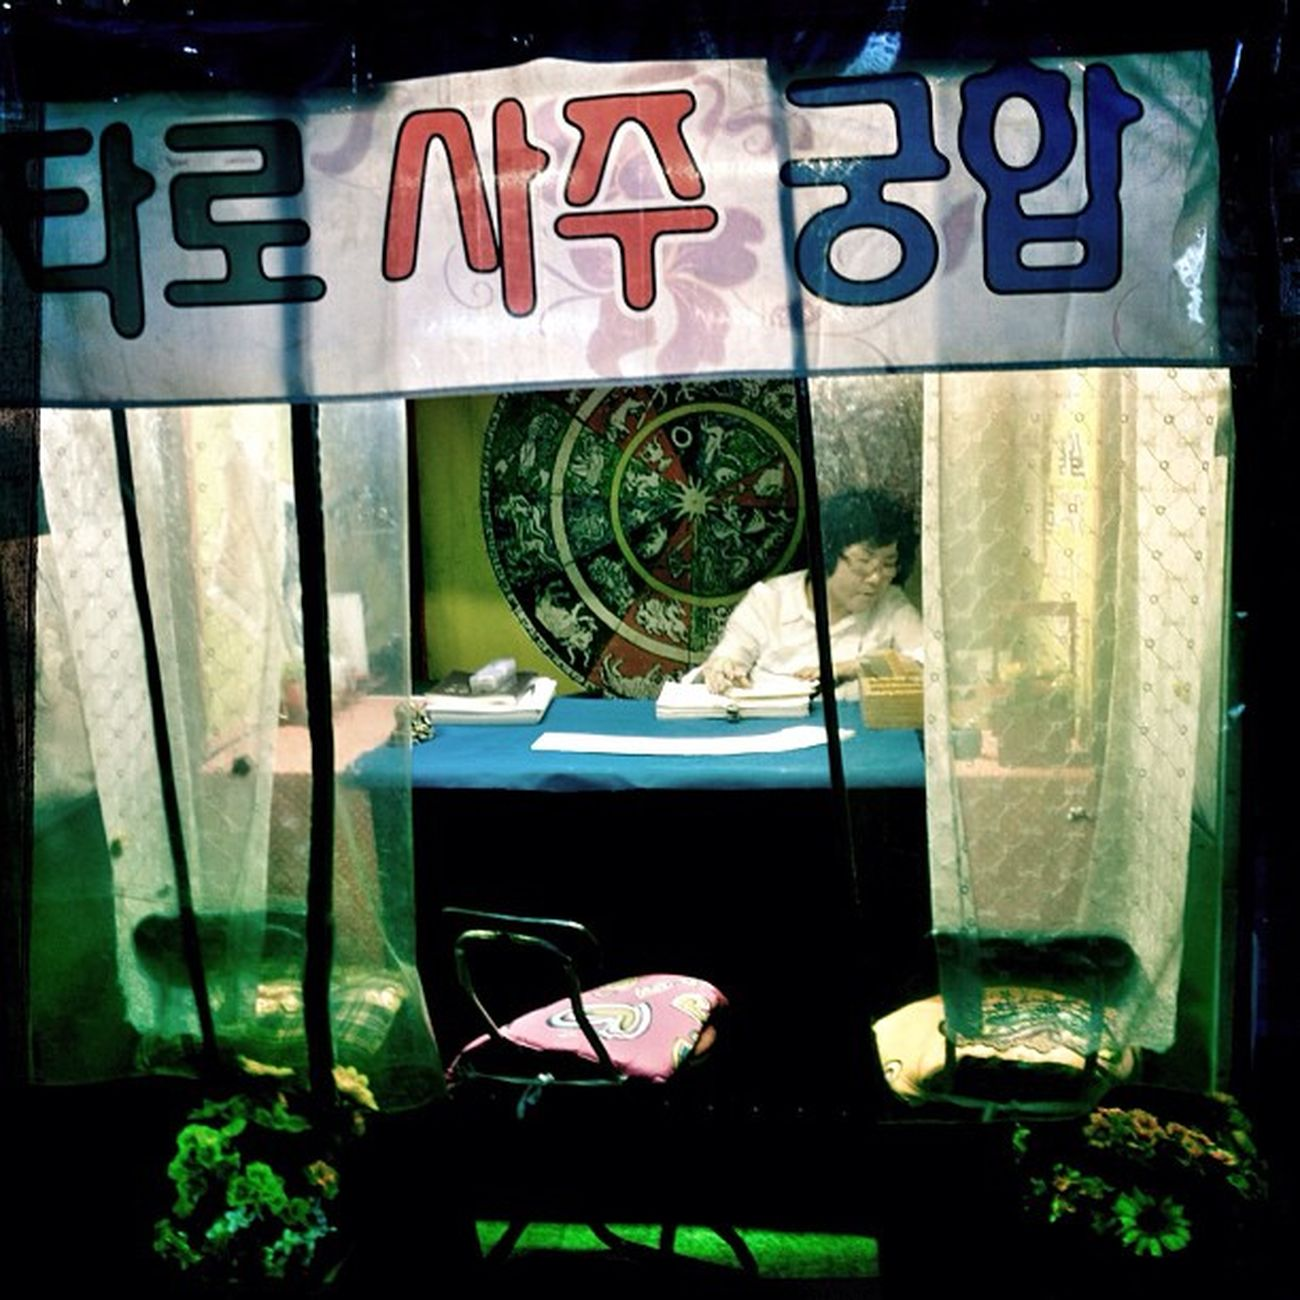 Fortune teller Jongno #seoul #seoul_korea #korea #jongno #people #street #hipstamatic #johns #bigup #travel #night Street Night People Hipstamatic Travel Korea Seoul Johns Bigup Jongno Seoul_korea